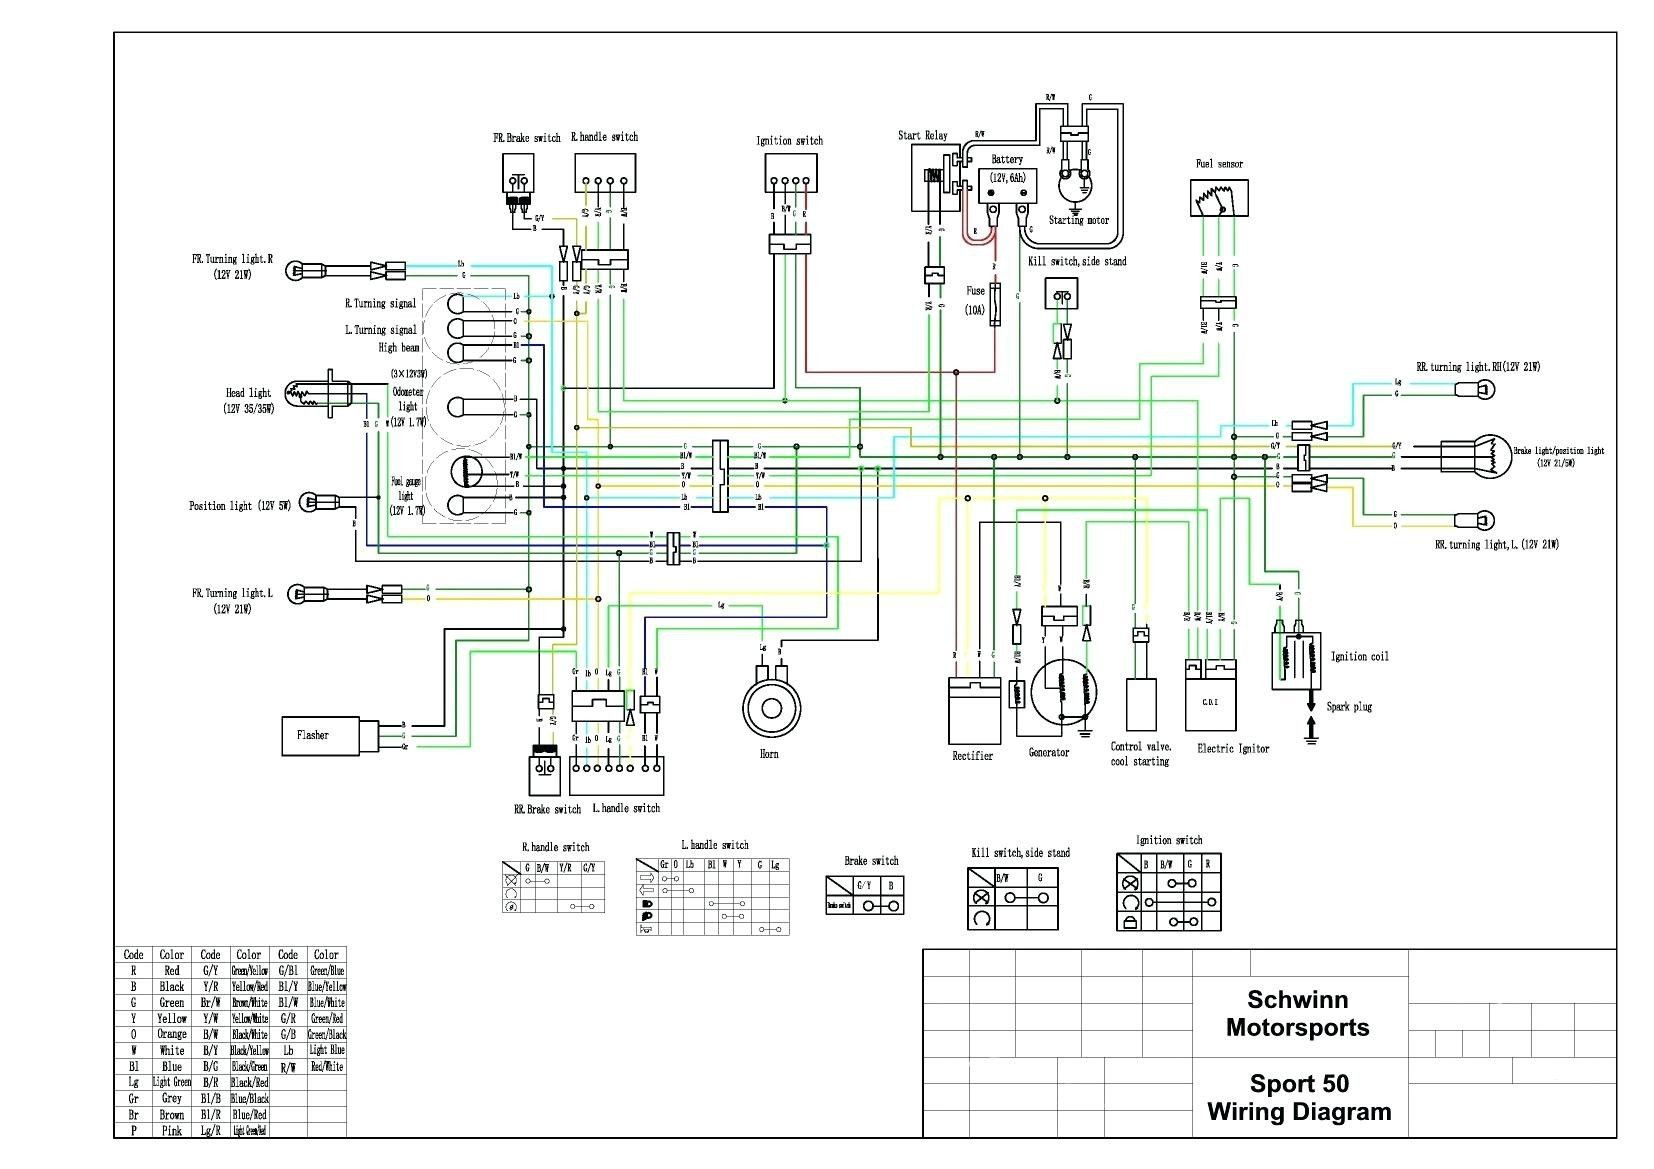 Taotao 50 Wiring Diagram New Electrical Wiring Diagram Electrical Diagram Motorcycle Wiring